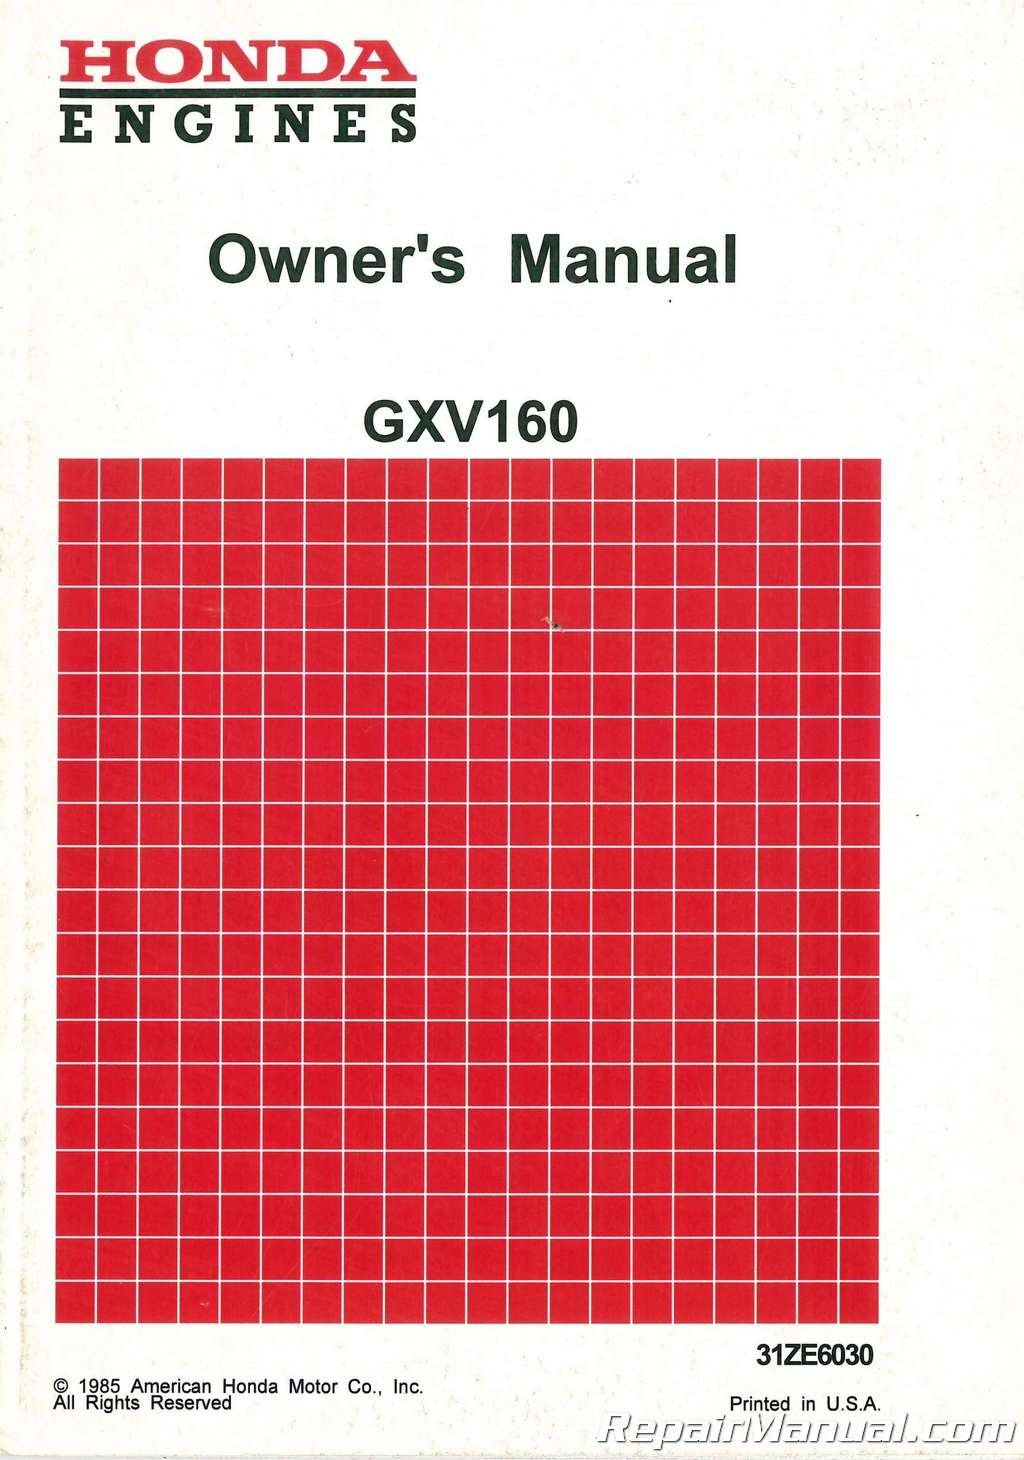 used honda gxv120 gxv160 engine owners manual rh repairmanual com Parts Manual Service ManualsOnline